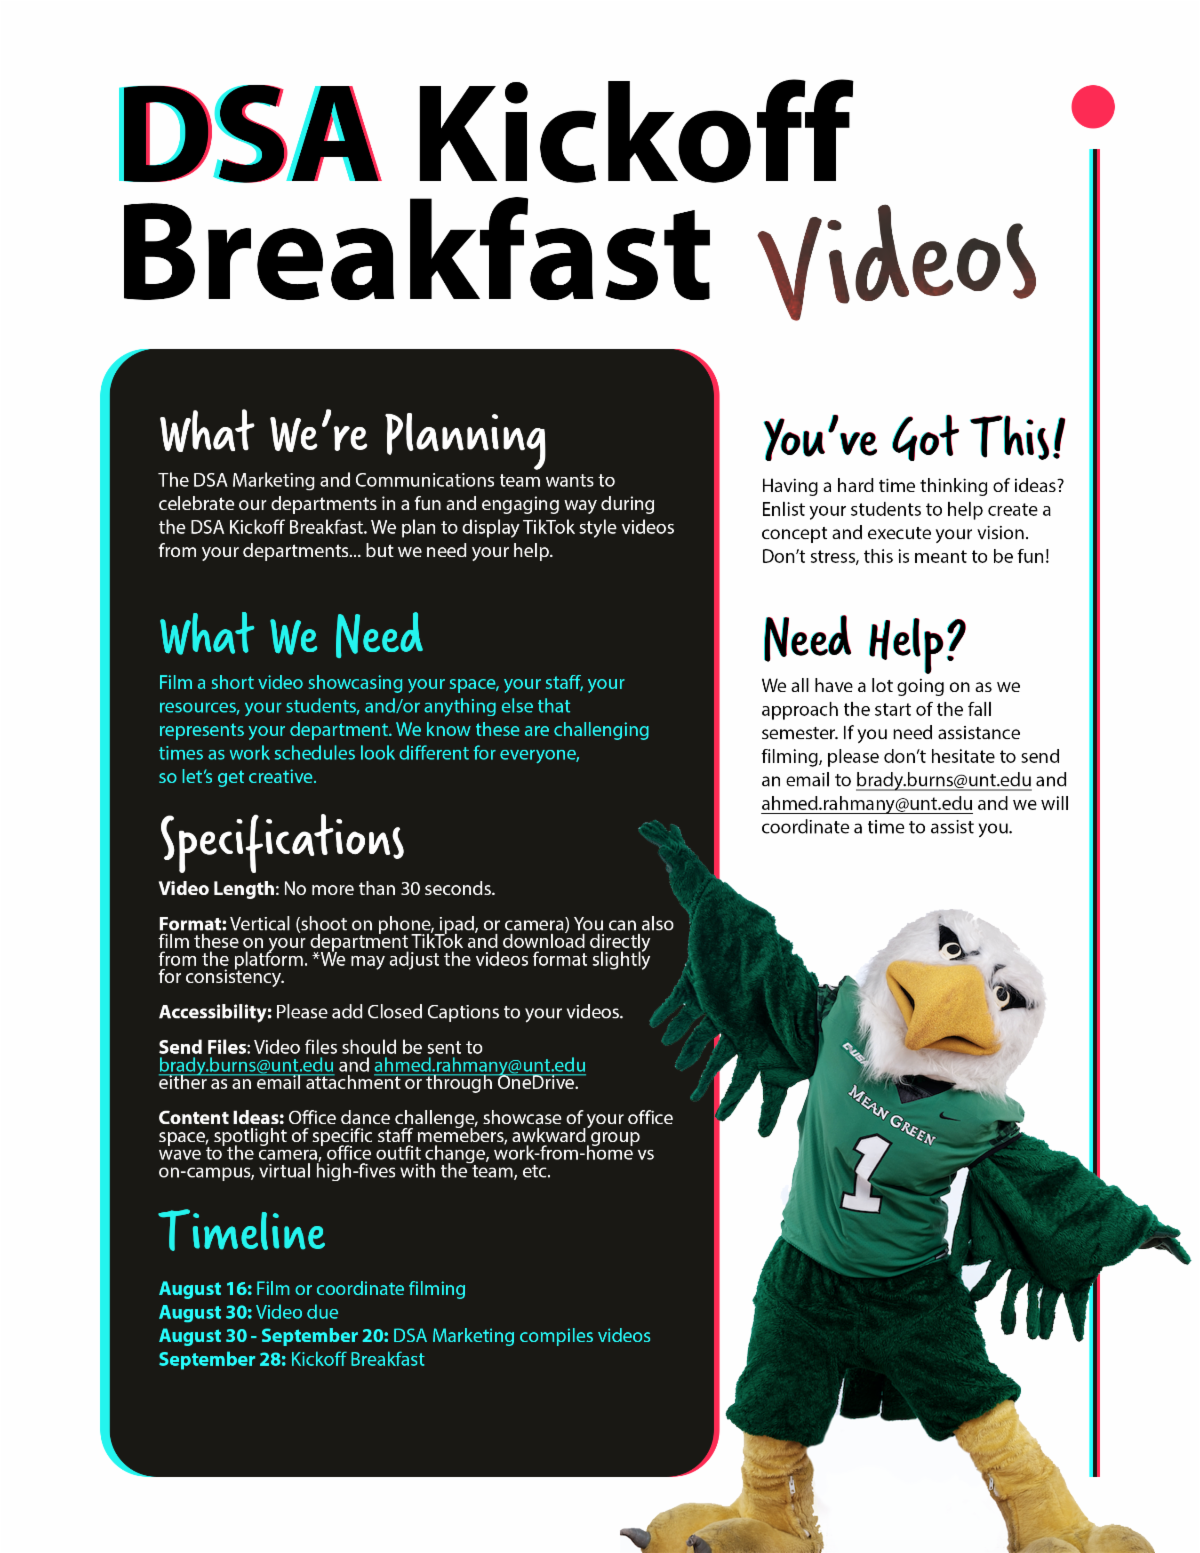 DSA Kickoff Breakfast Video Instructions.png